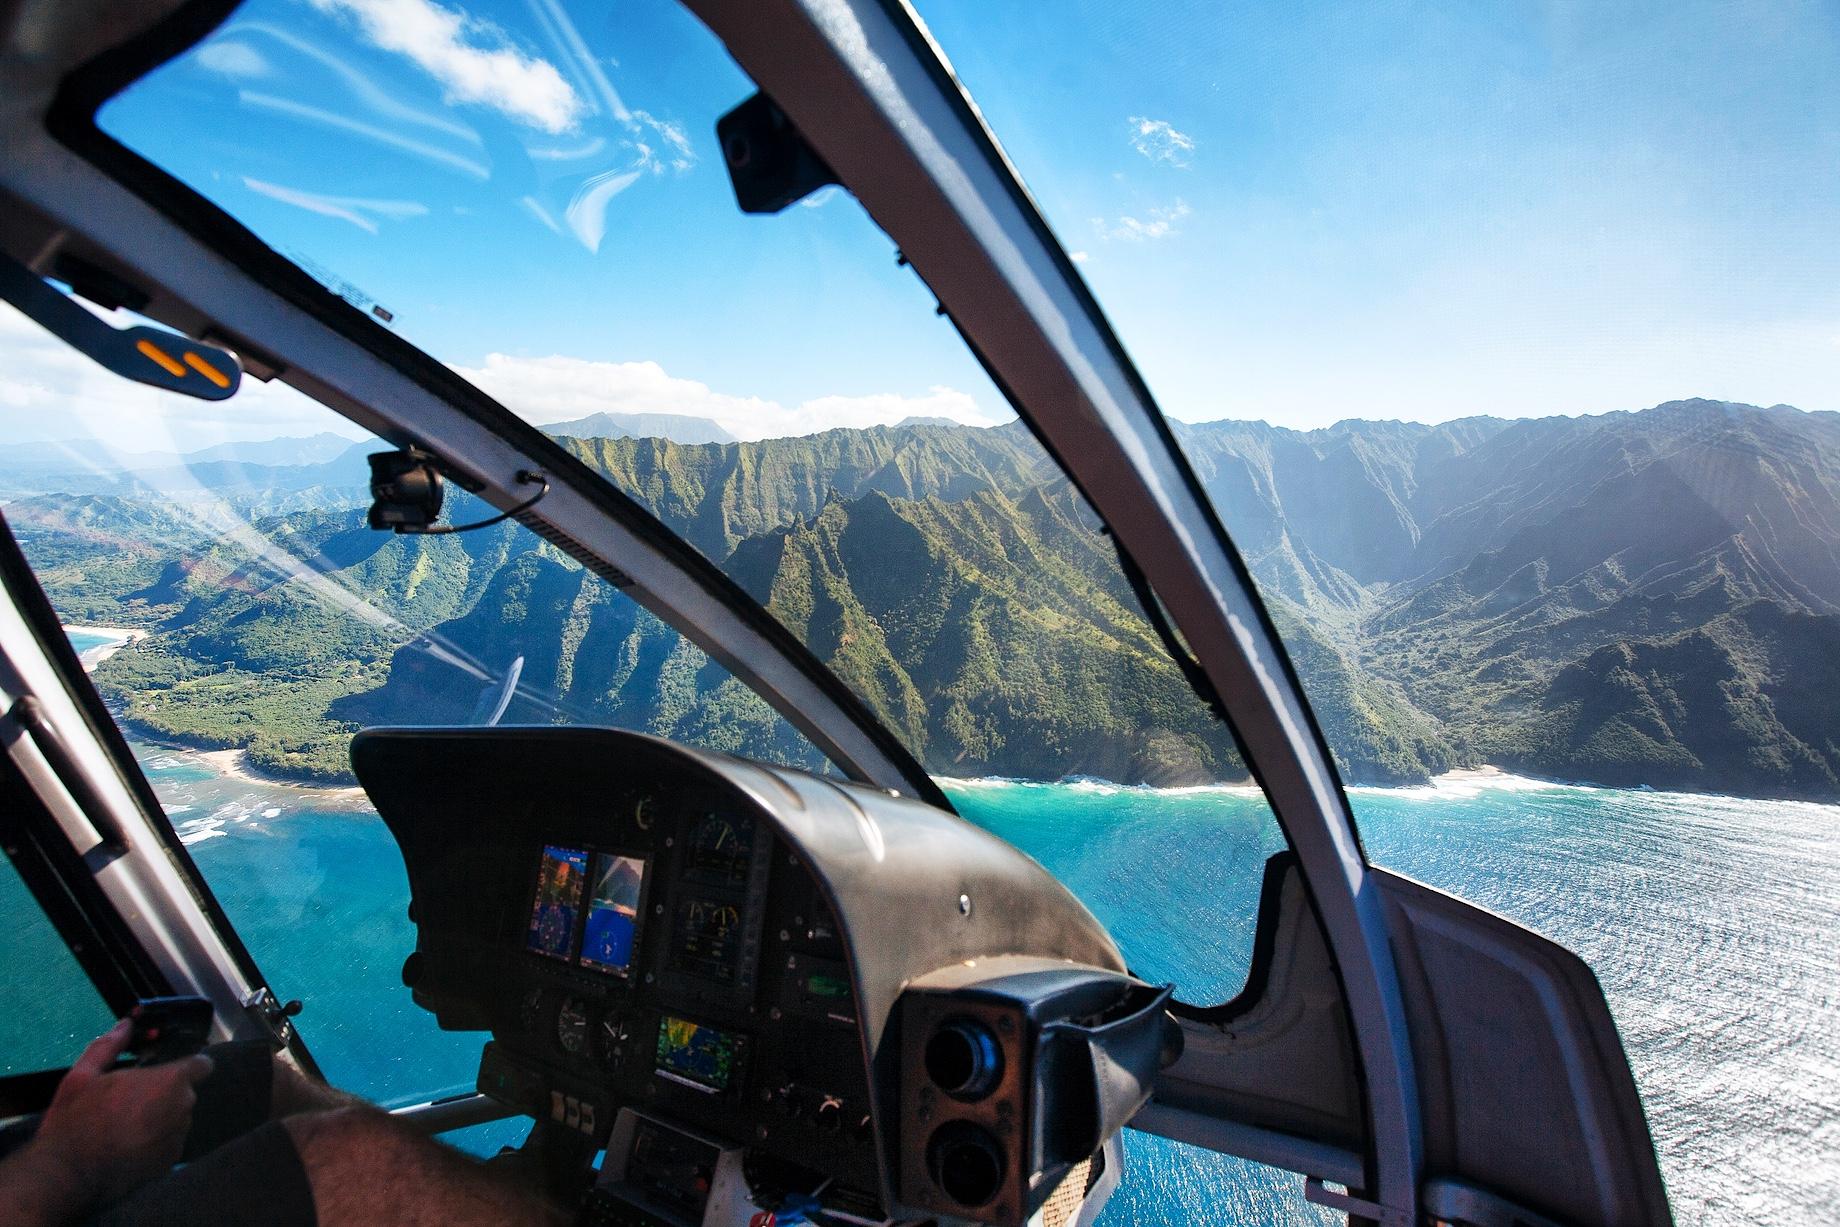 Helicopter Cockpit Scenic Flight - Na Pali Coast - Kauai, Hawaii, United States